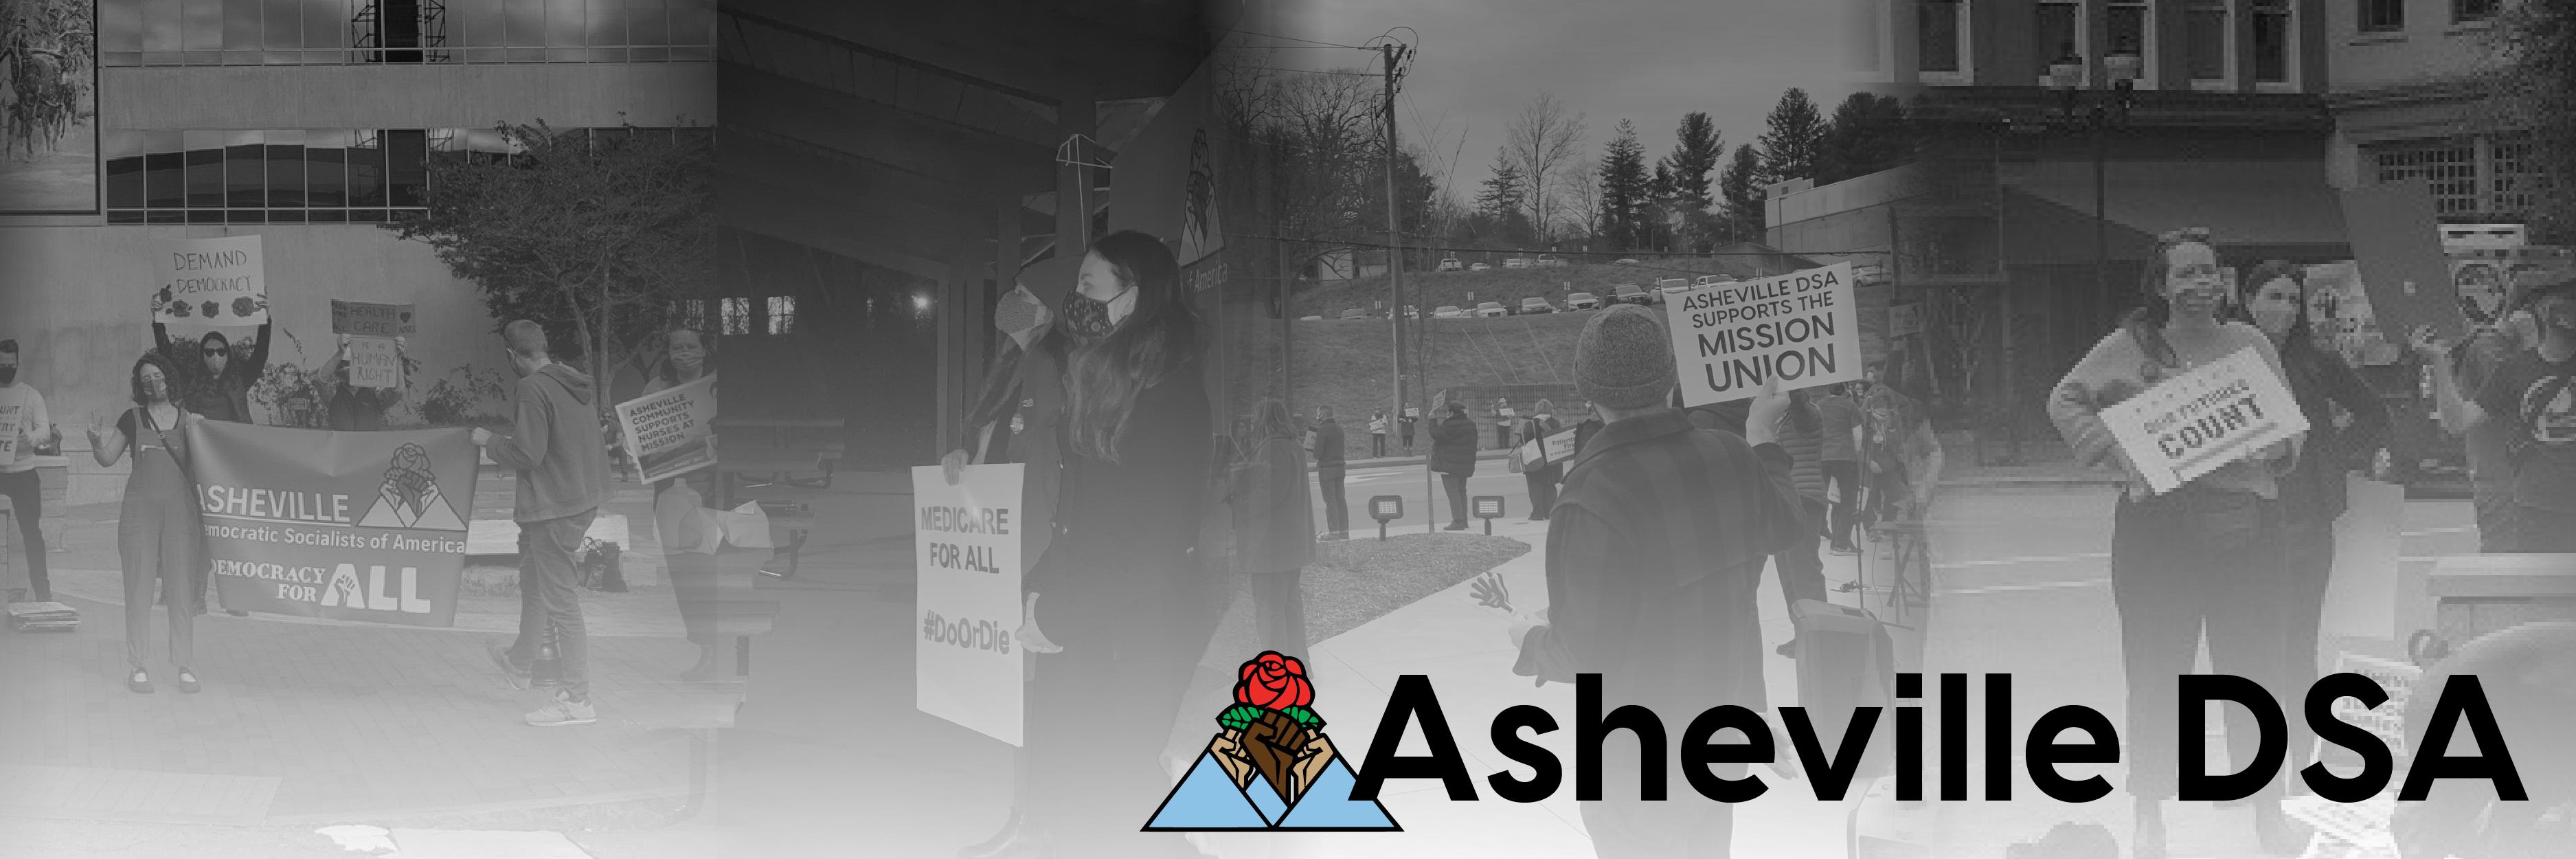 Asheville DSA